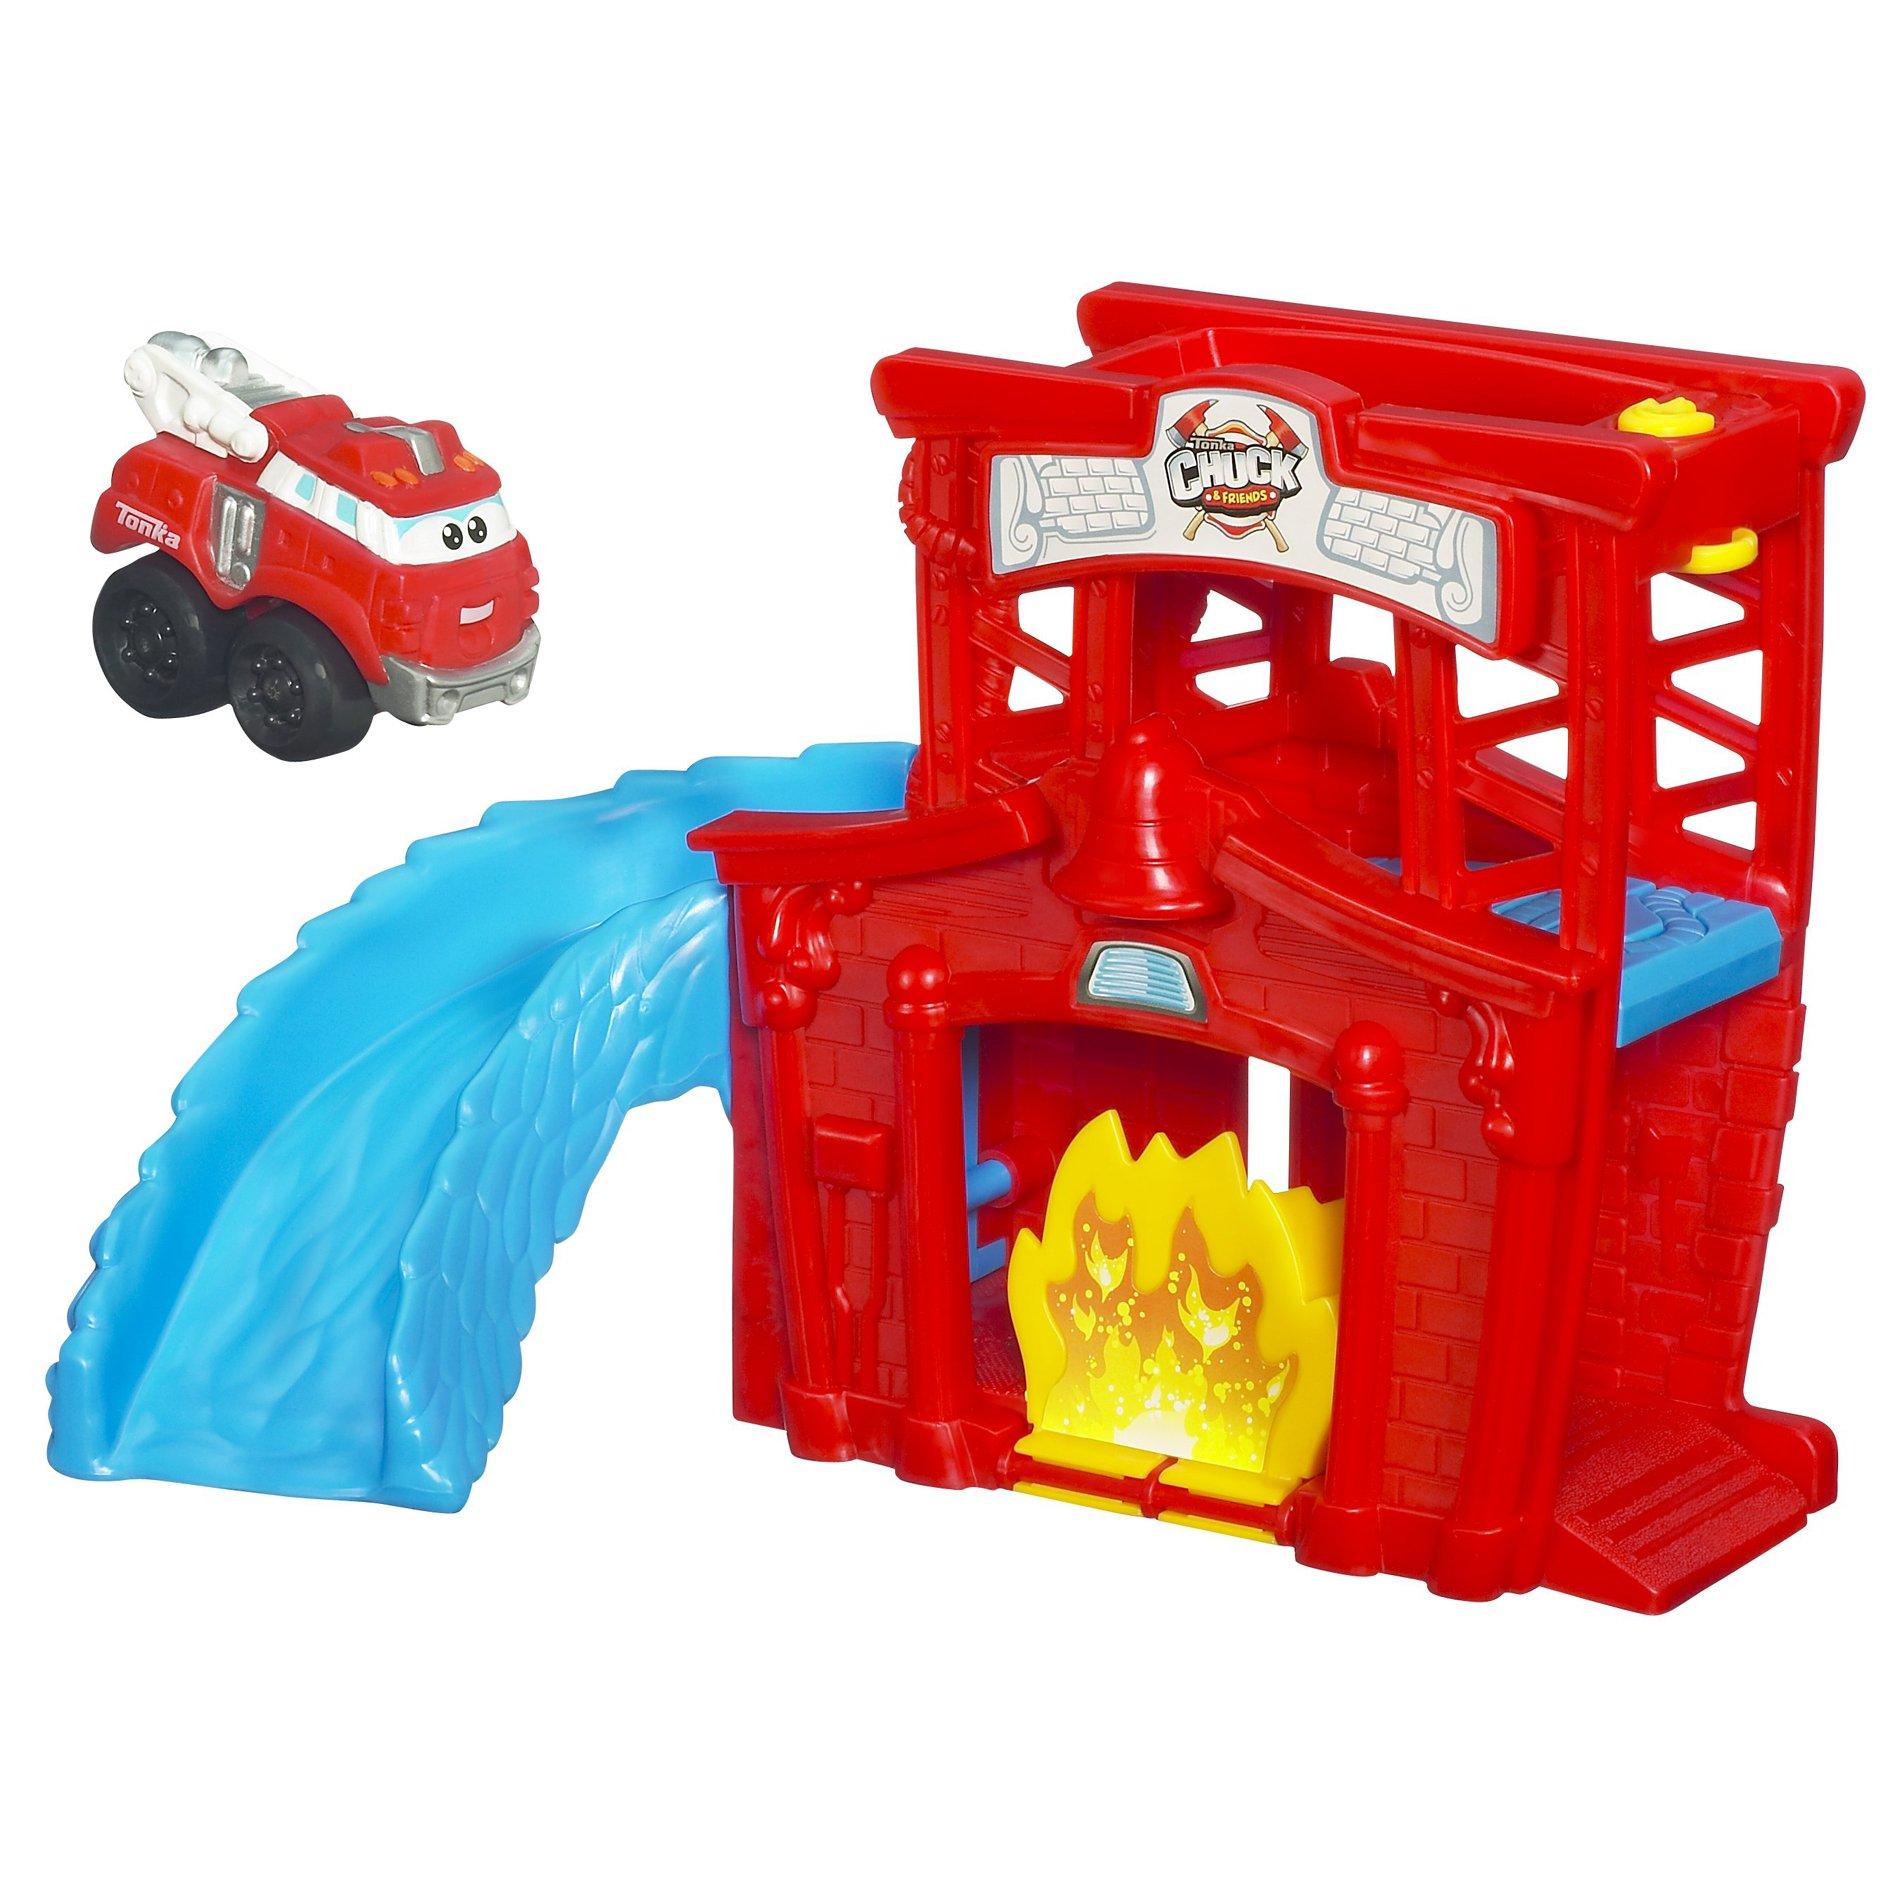 Tonka Chuck Mini Fold N Go - Fire Station Splash